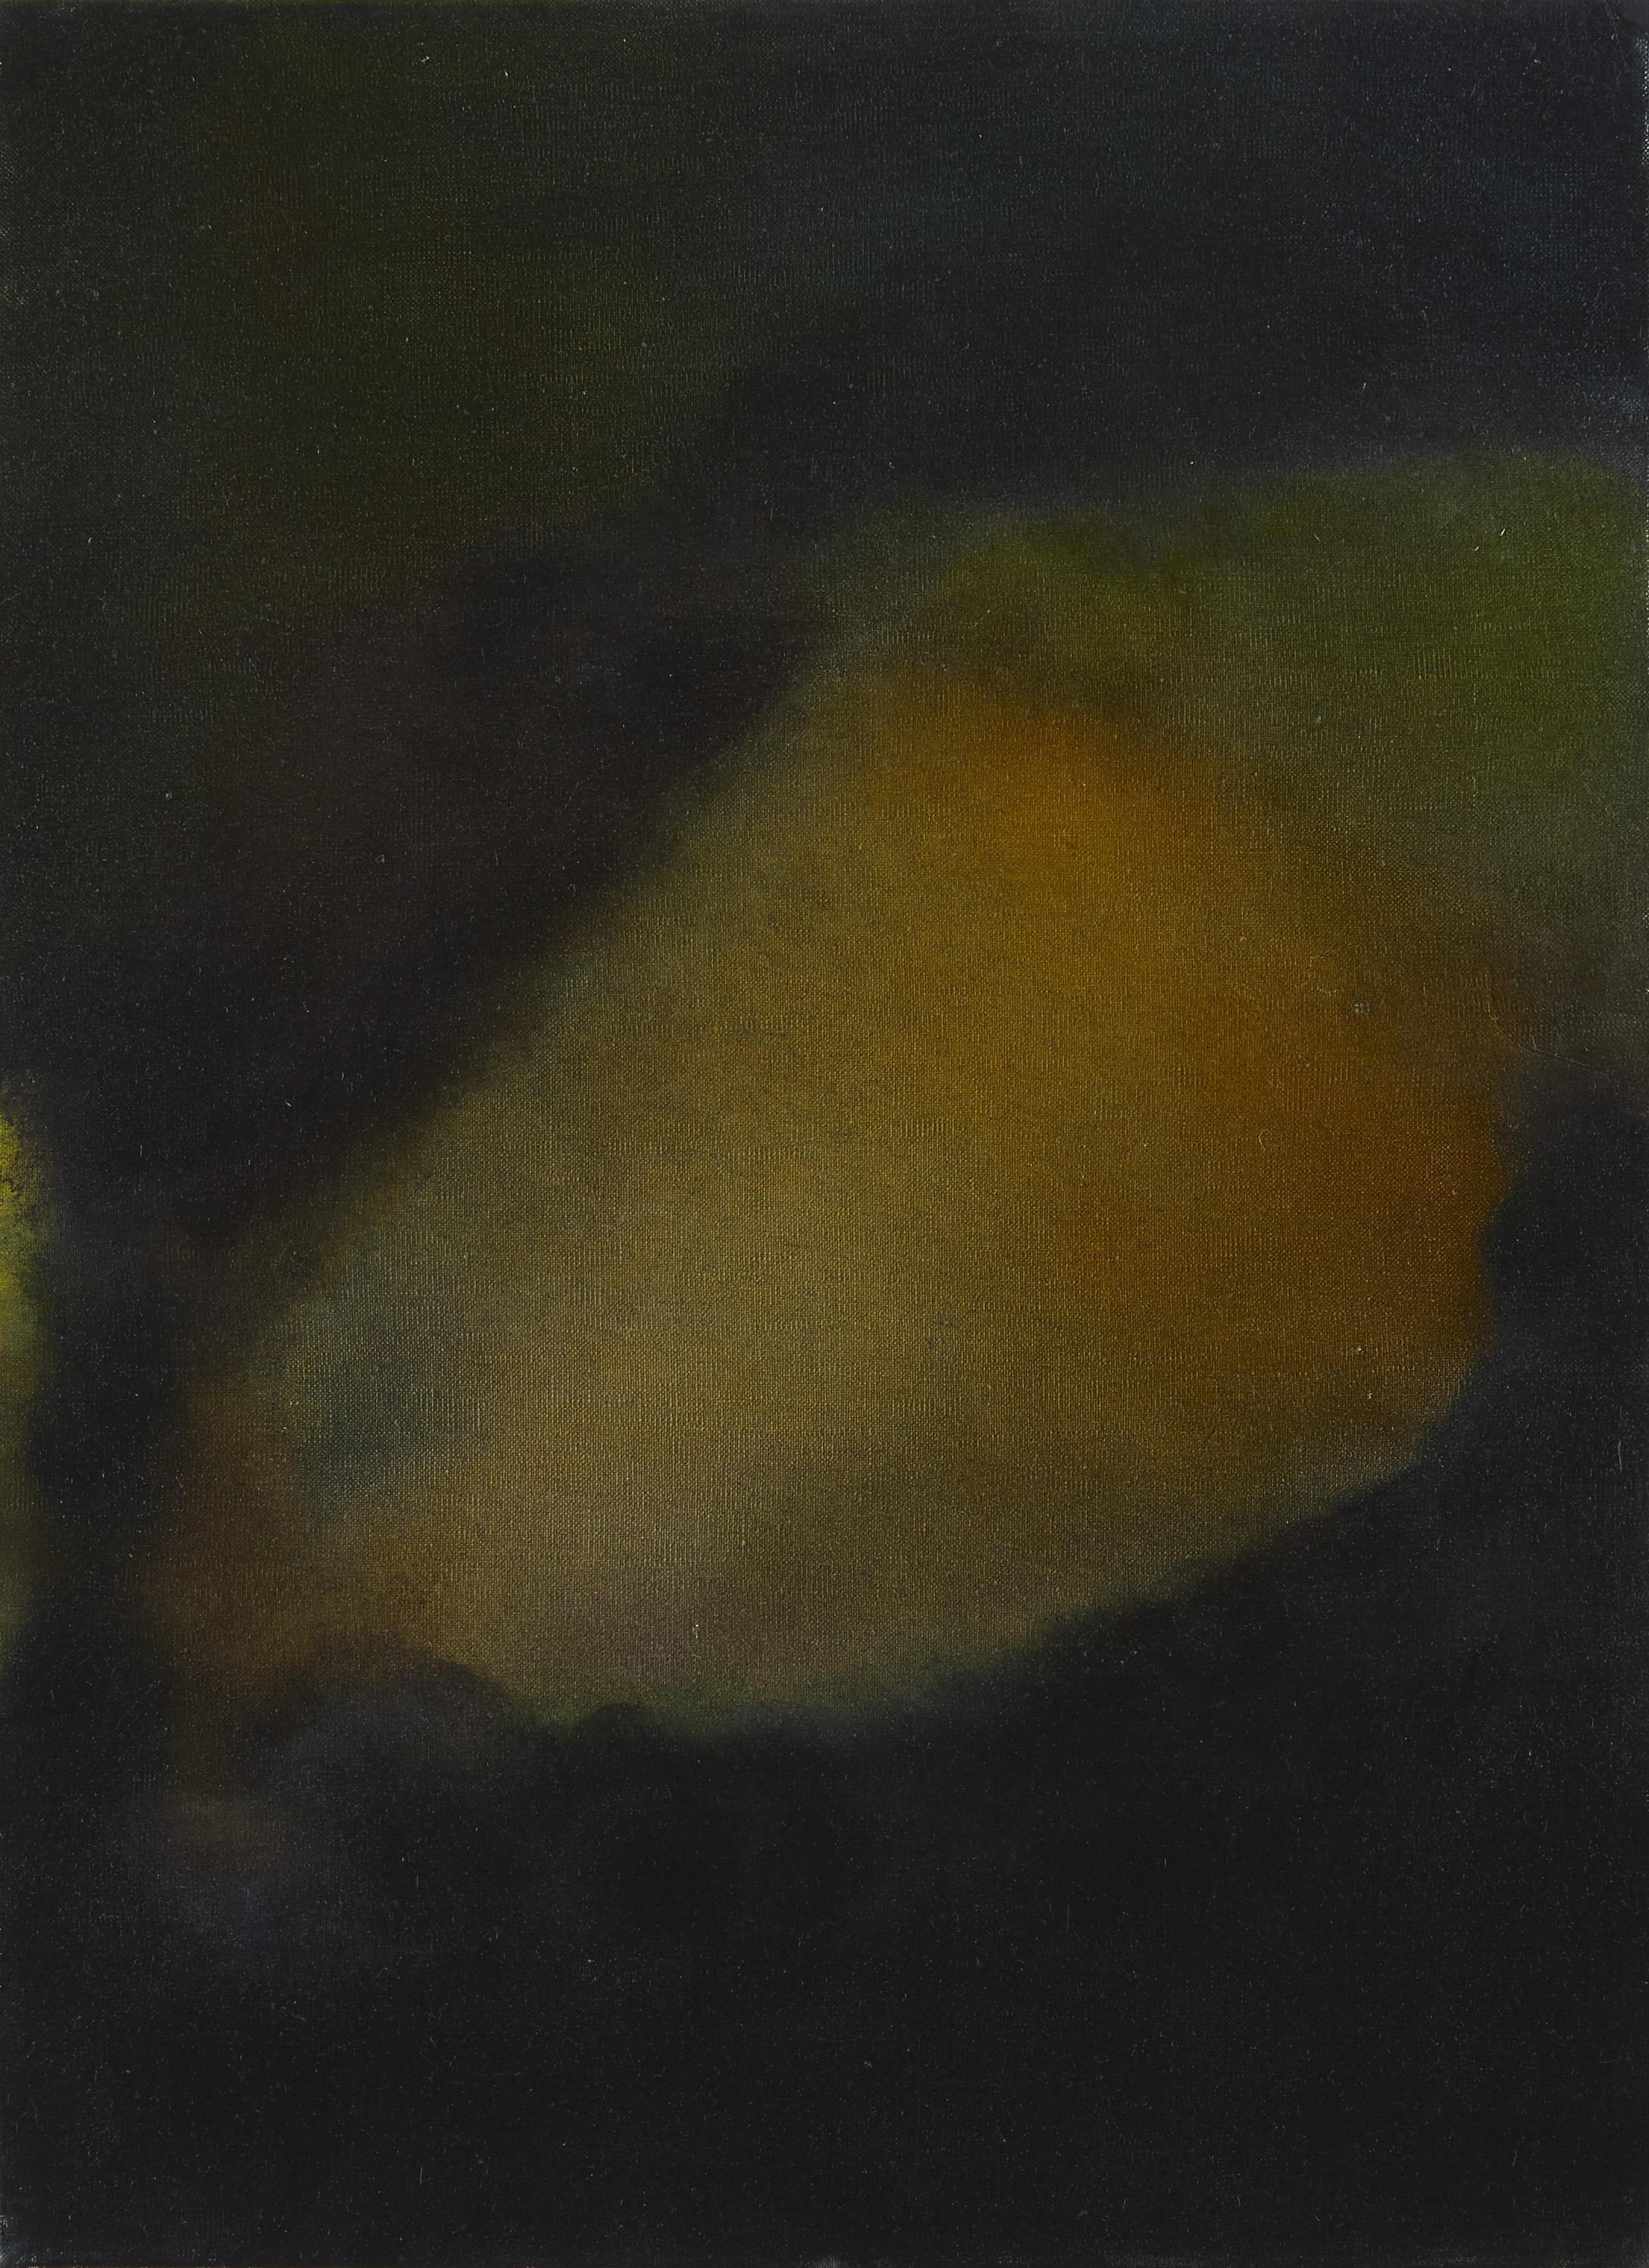 """Untitled Study II"" 16""x12"" Oil on Linen, 2016"